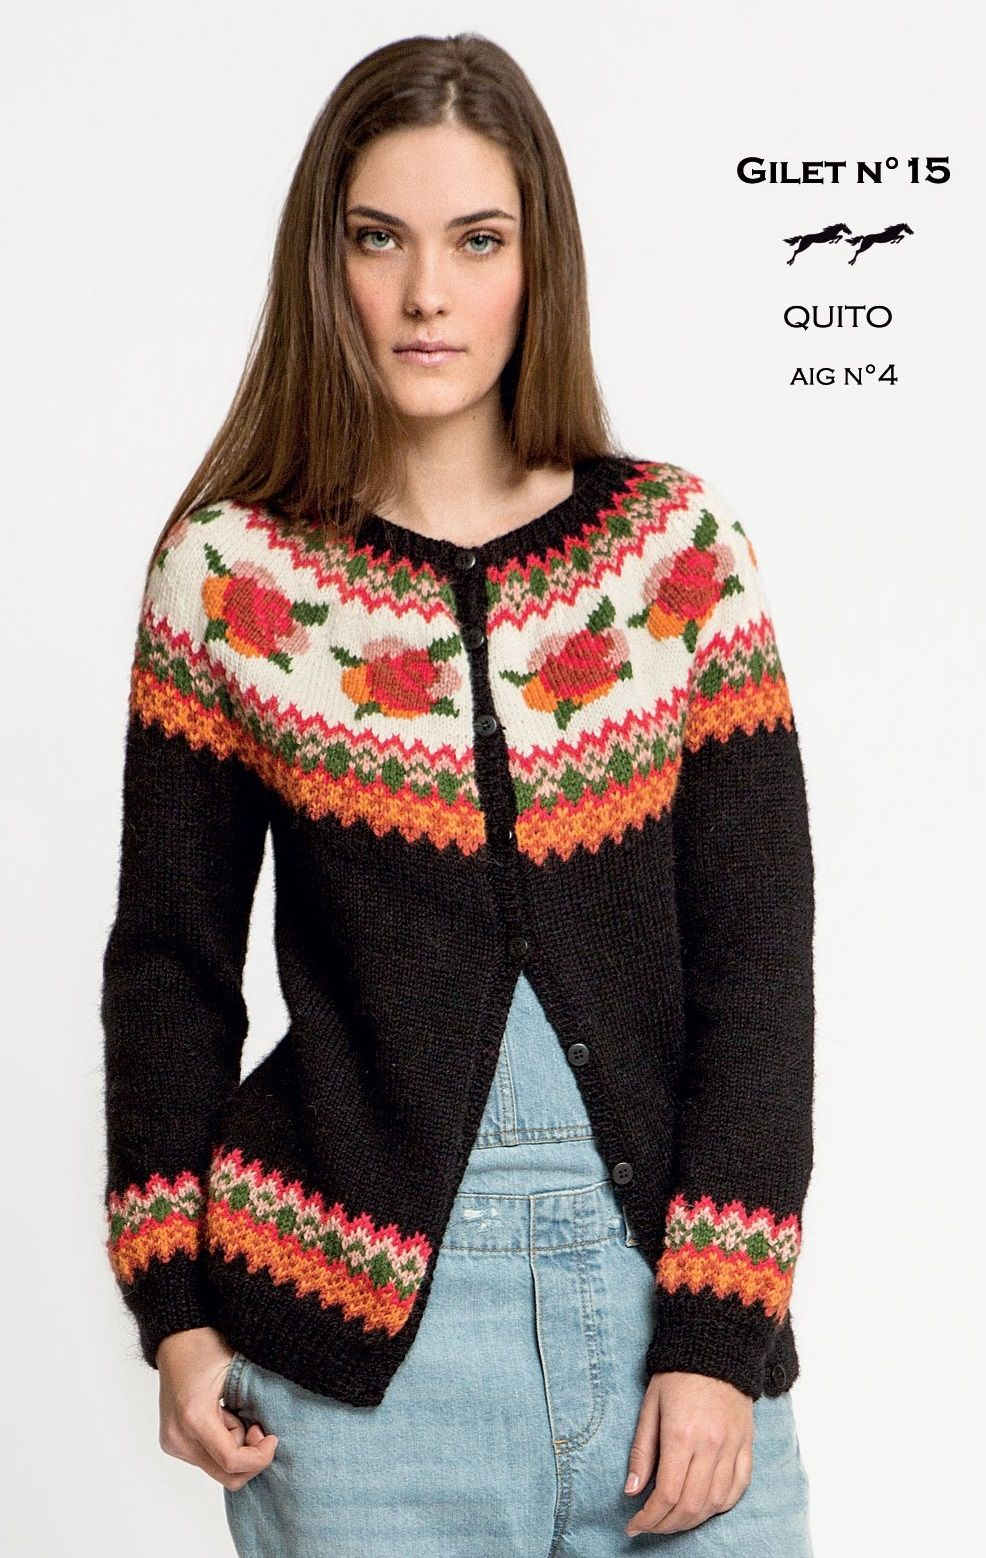 dc68db0a0 Free Knitting Pattern for a Rose Fair Isle Yoke Cardigan